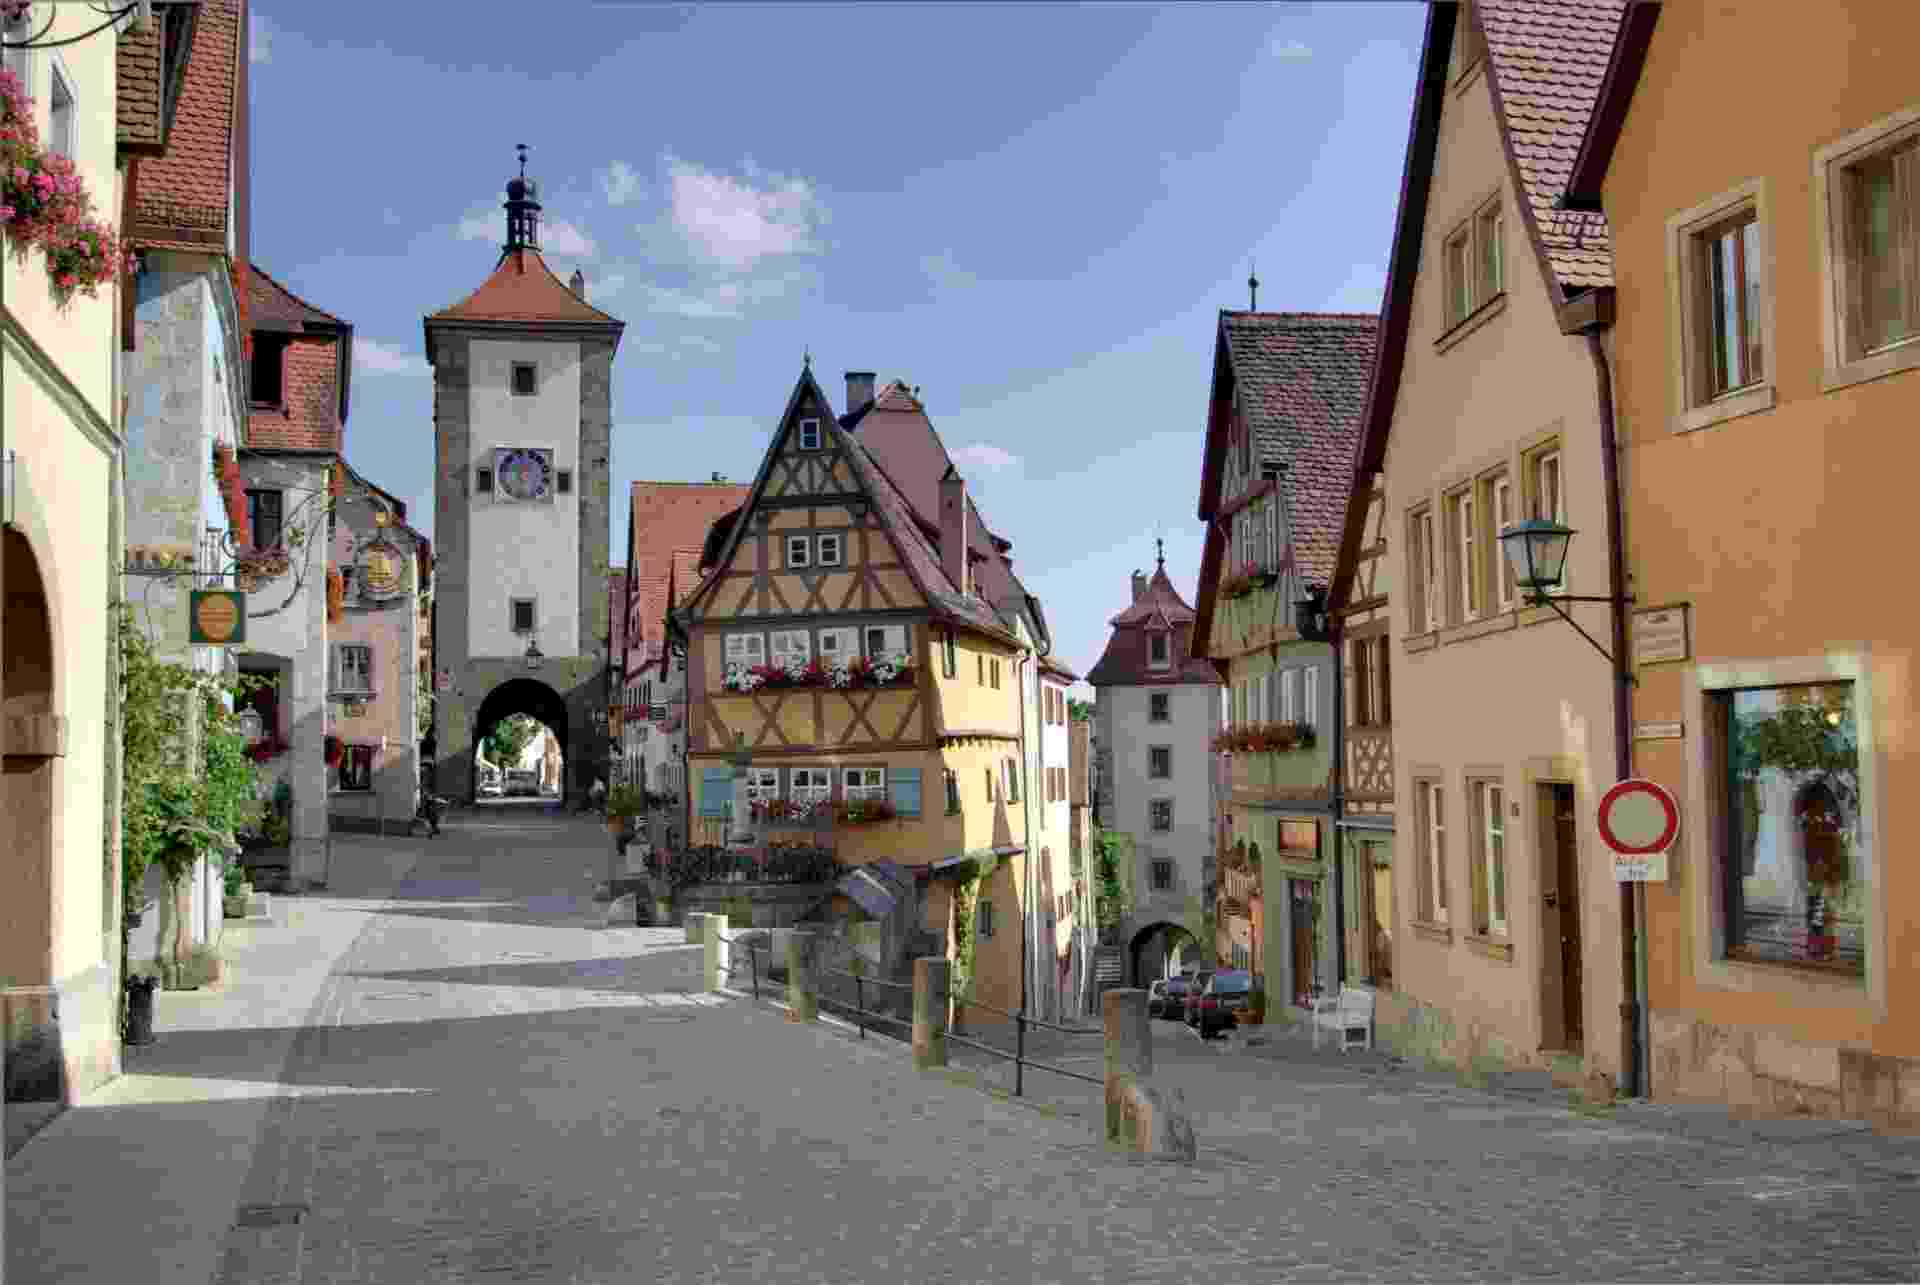 Rothenburg ob der Tauber, na Alemanha - Berthold Werner/Creative Commons